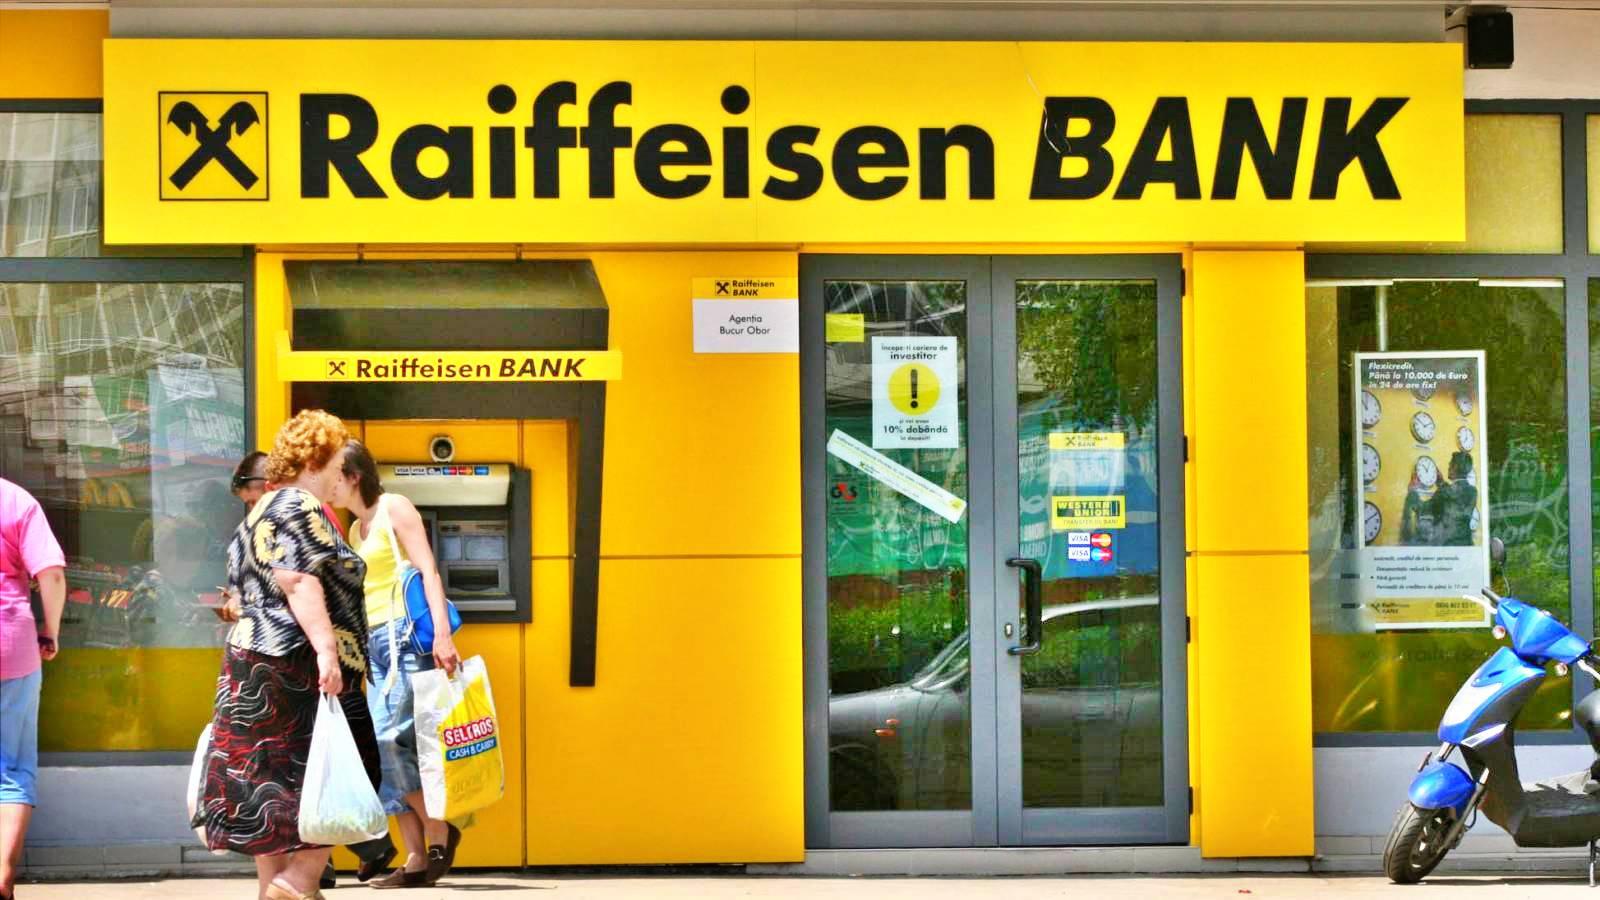 Raiffeisen Bank vacanta